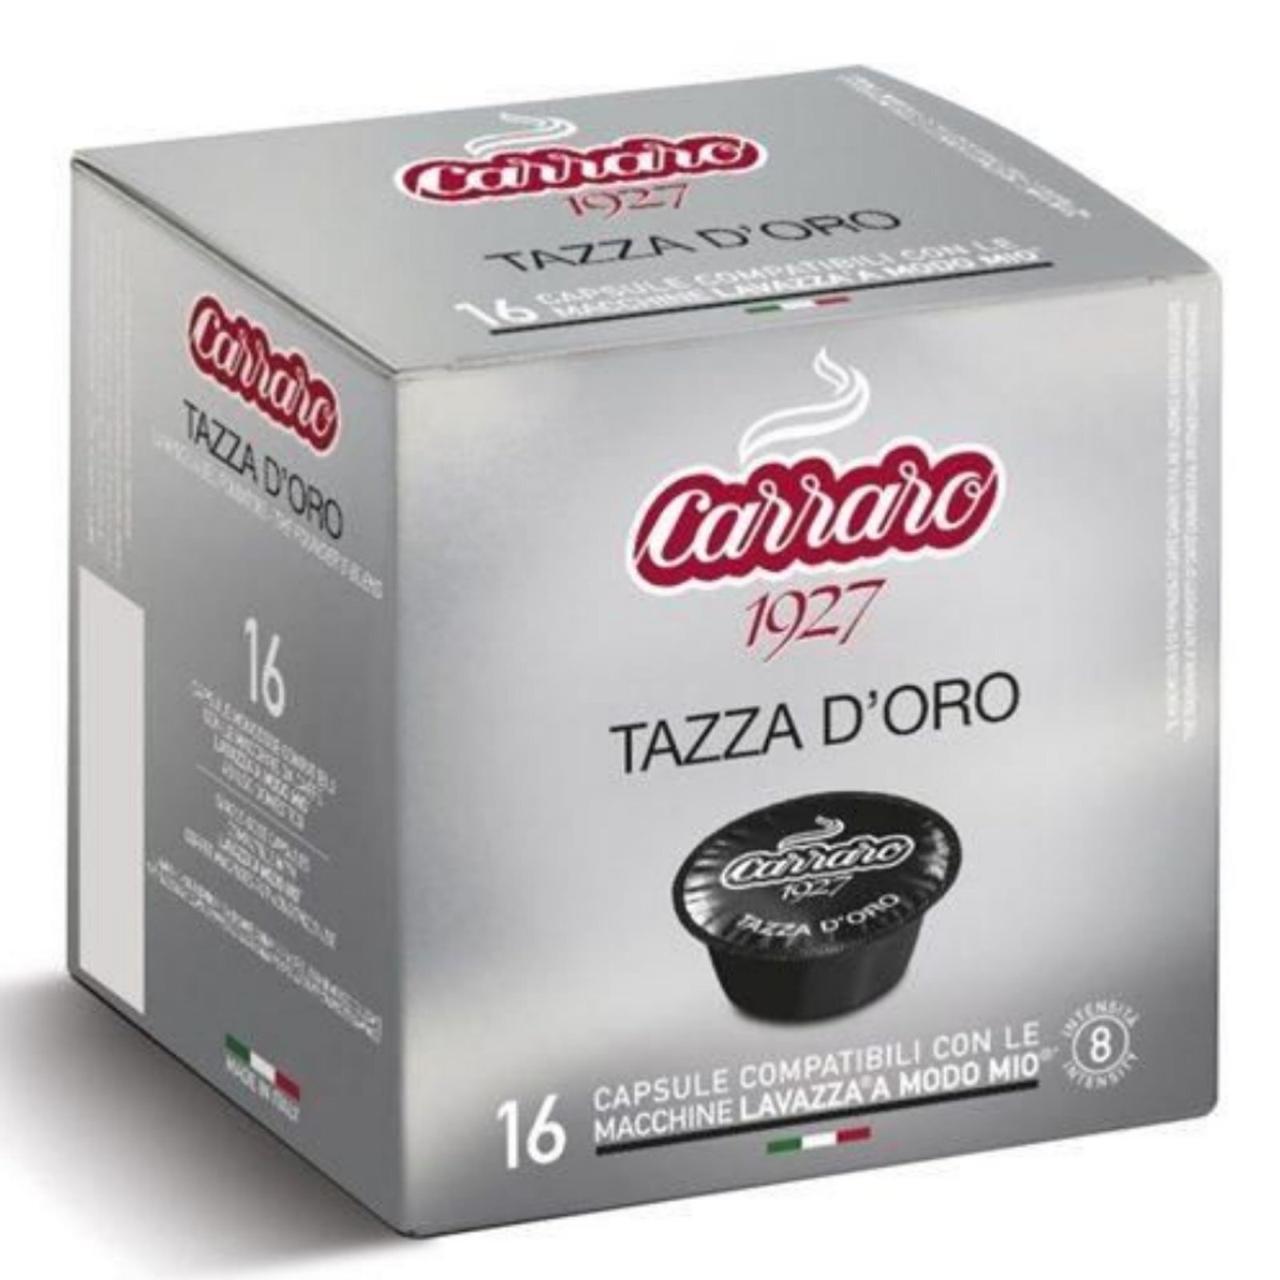 Кофе в капсулах Carraro TAZZA D'ORO 16шт